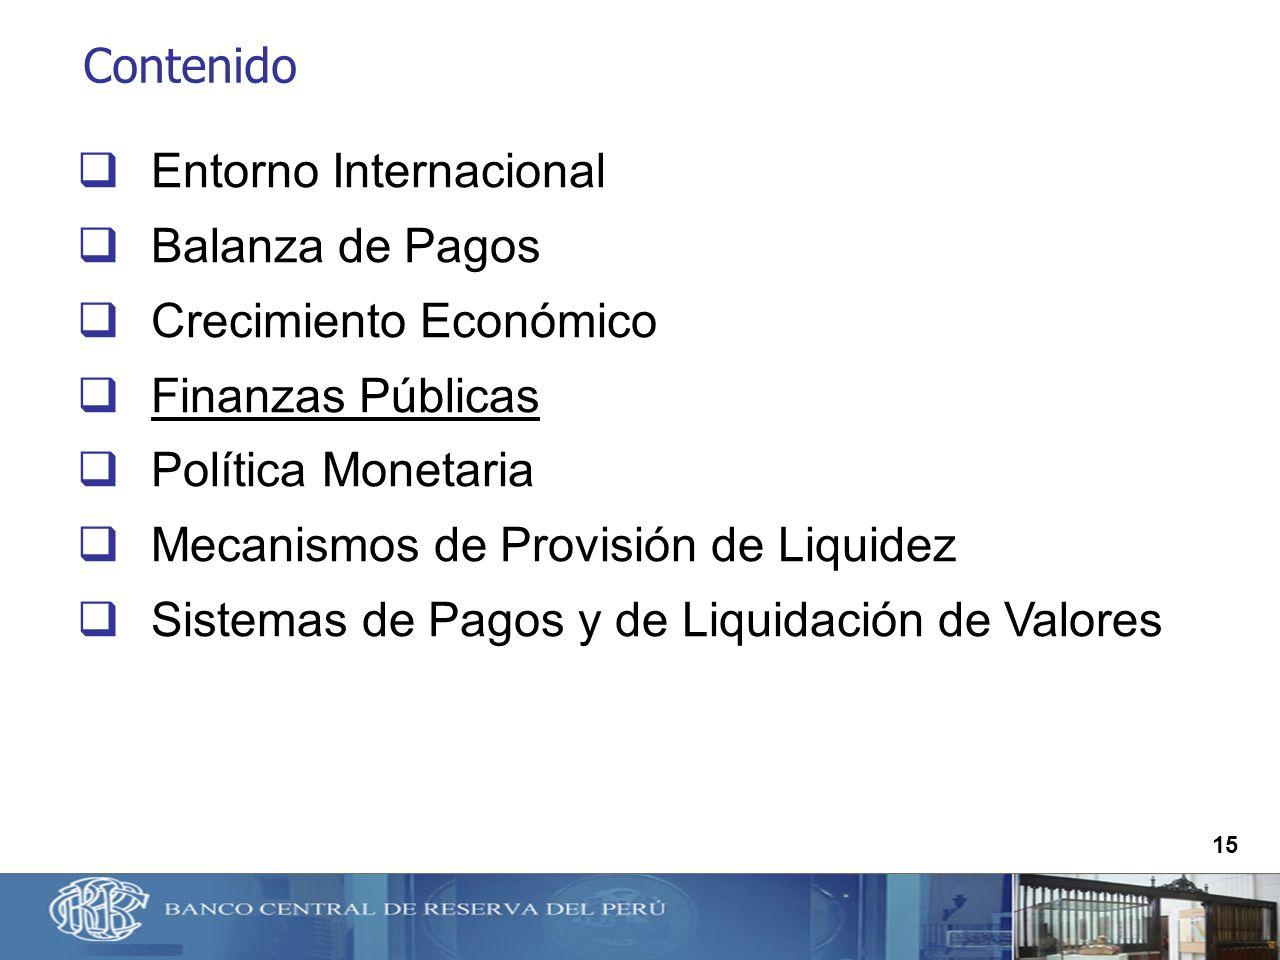 15 Contenido Entorno Internacional Balanza de Pagos Crecimiento Económico Finanzas Públicas Política Monetaria Mecanismos de Provisión de Liquidez Sis